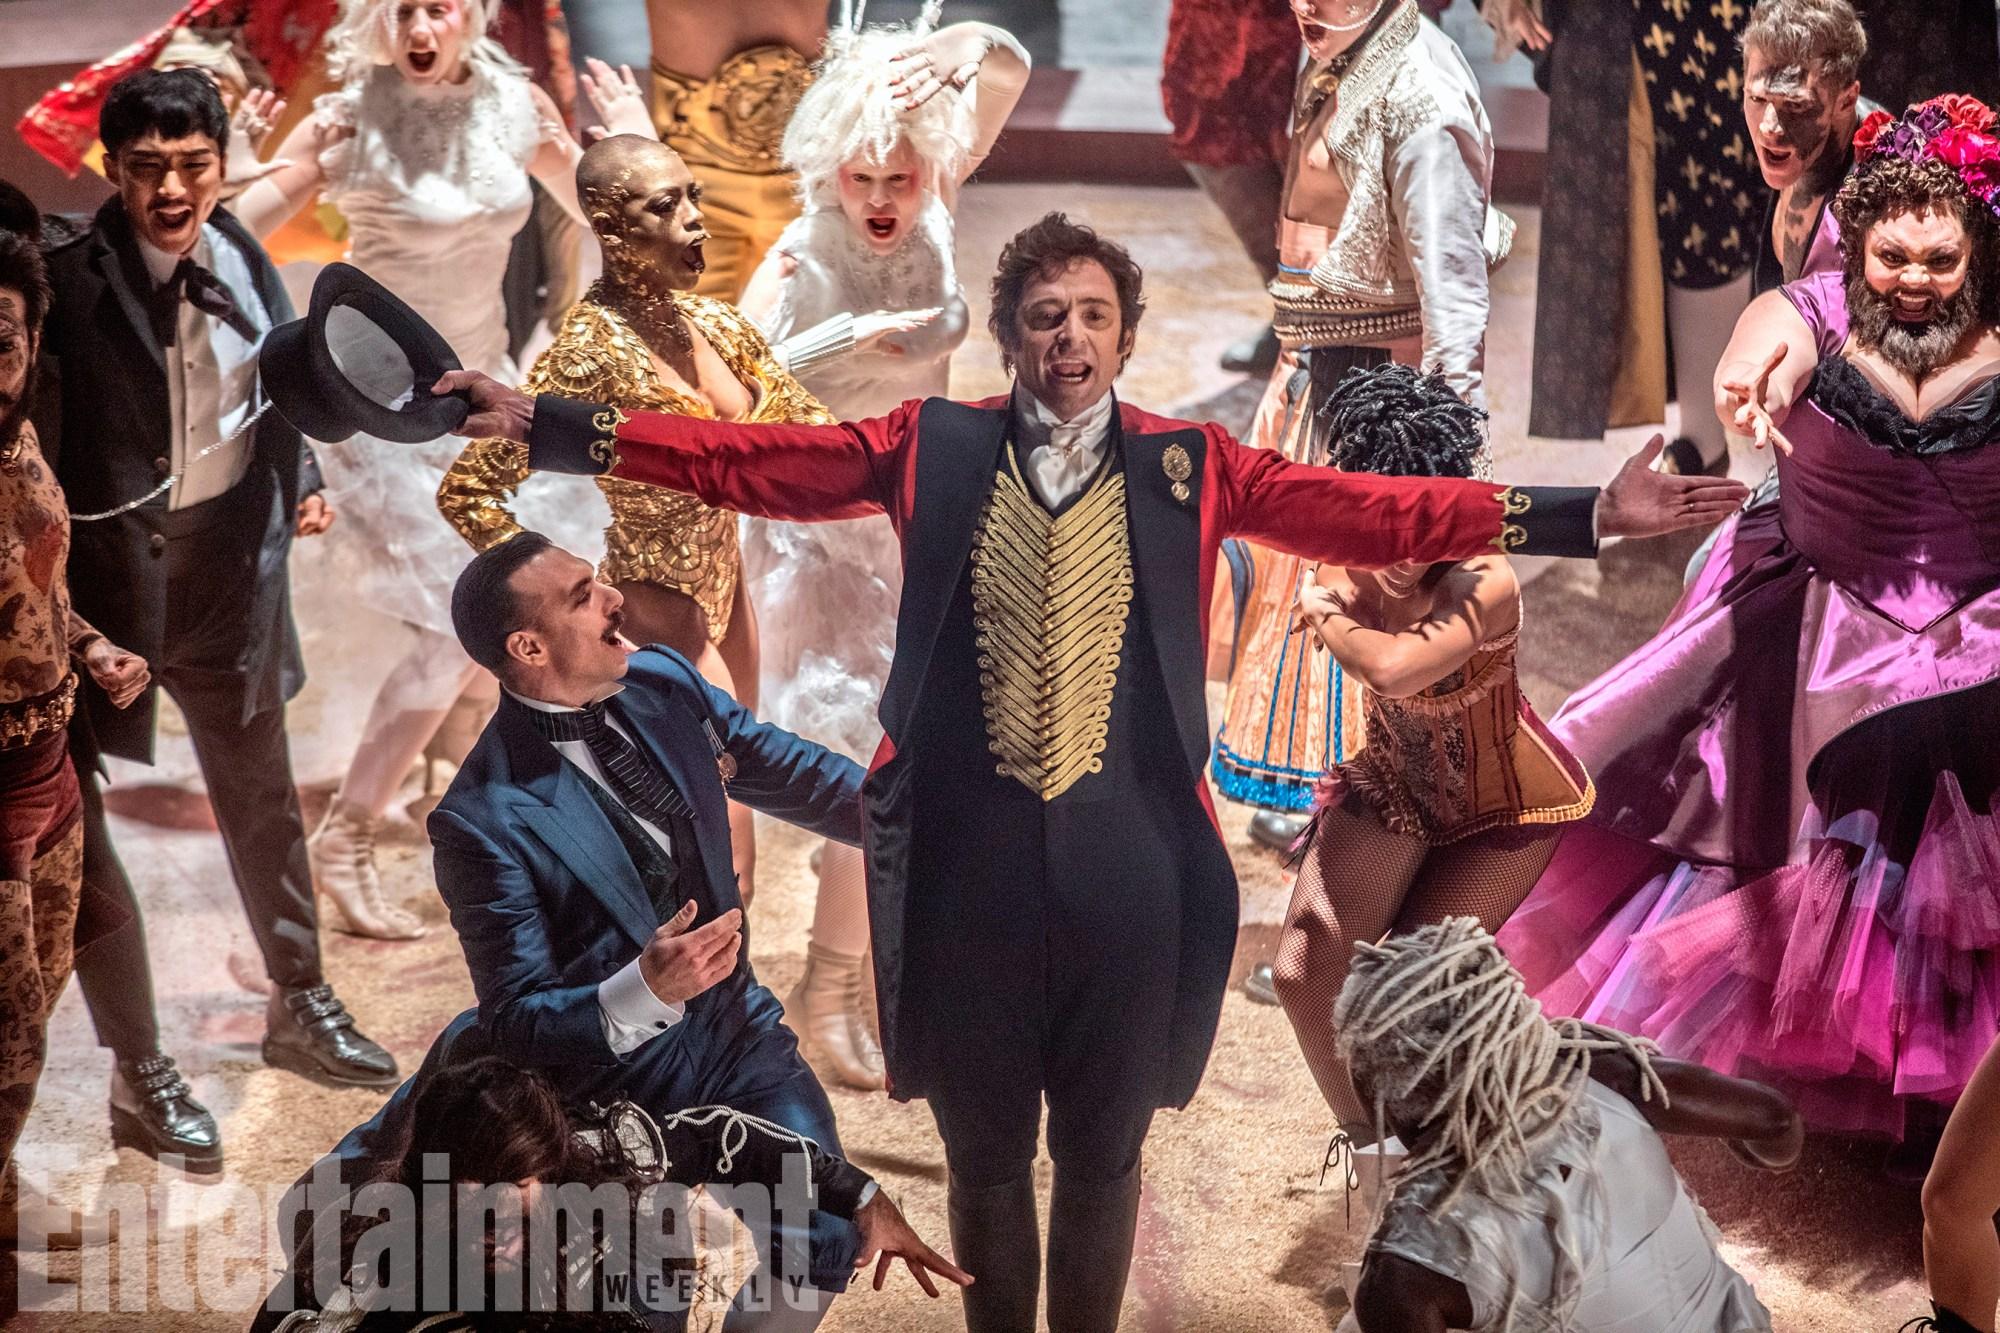 The Greatest Showman (2017)Hugh Jackman